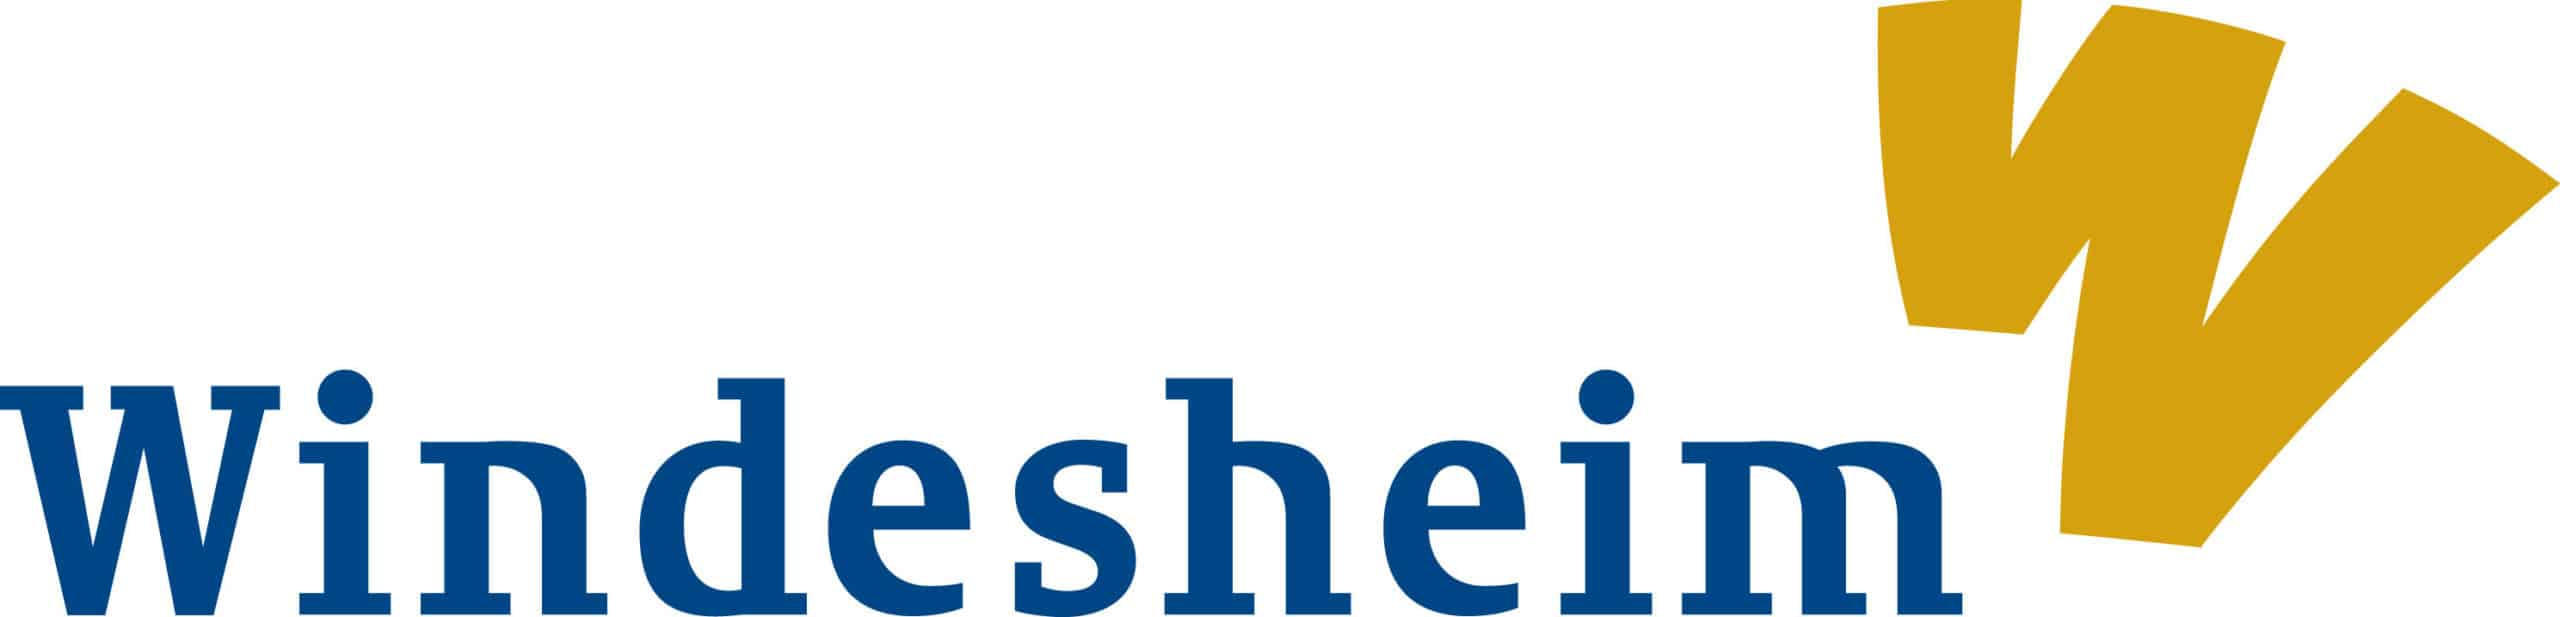 Windesheim-logo-3-scaled